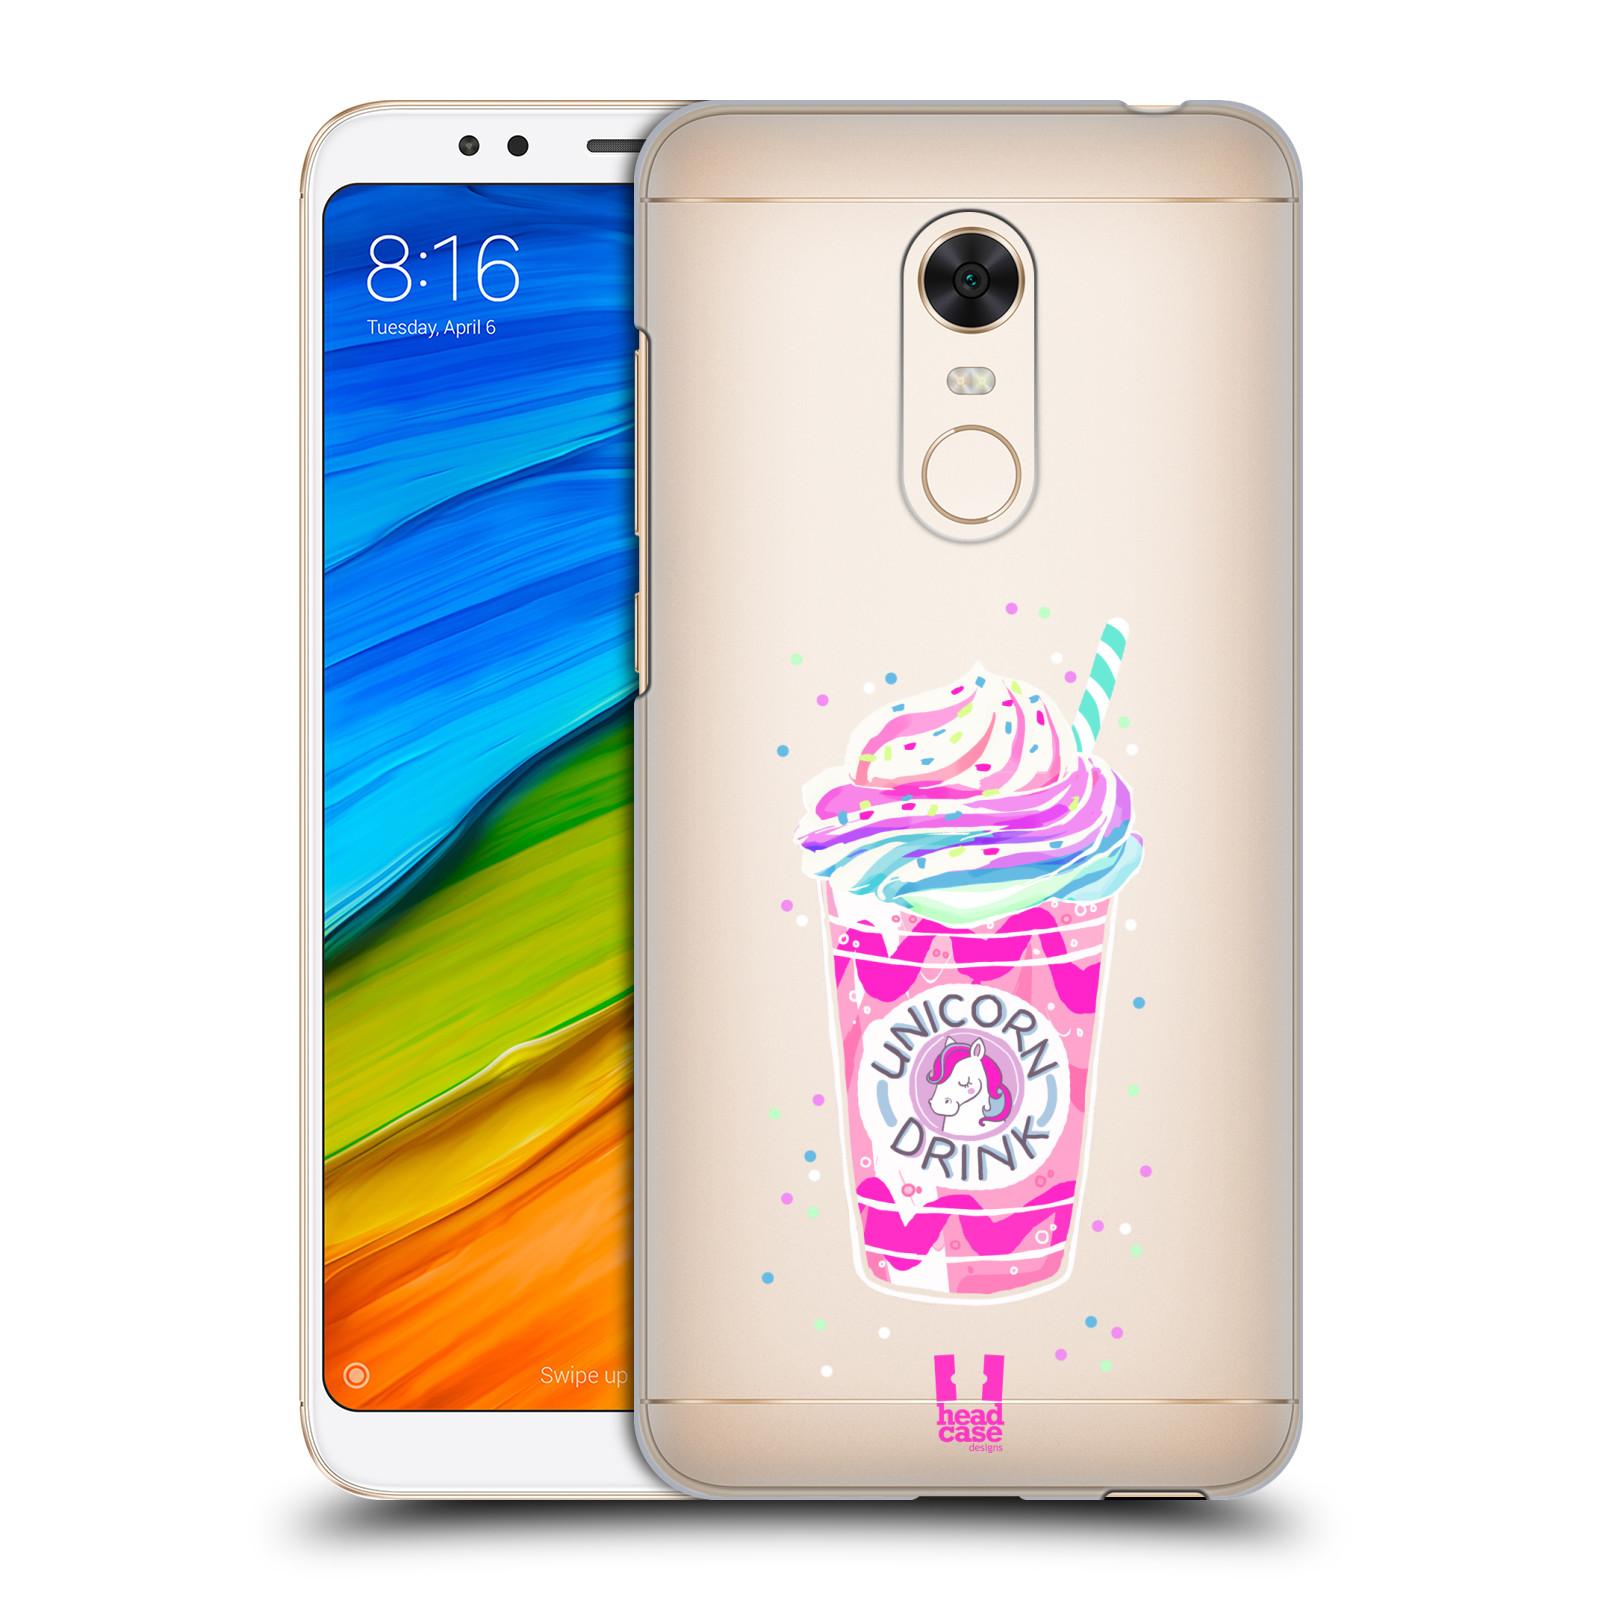 Plastové pouzdro na mobil Xiaomi Redmi 5 Plus - Head Case - Unicorn drink